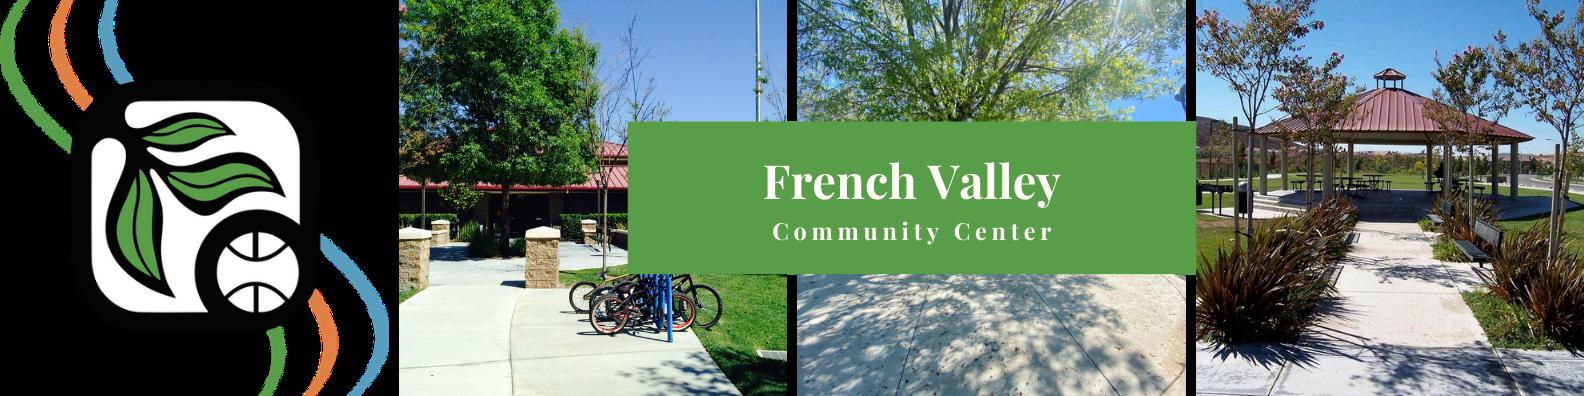 May contain: bicycle, transportation, bike, and vehicle, facility, logo